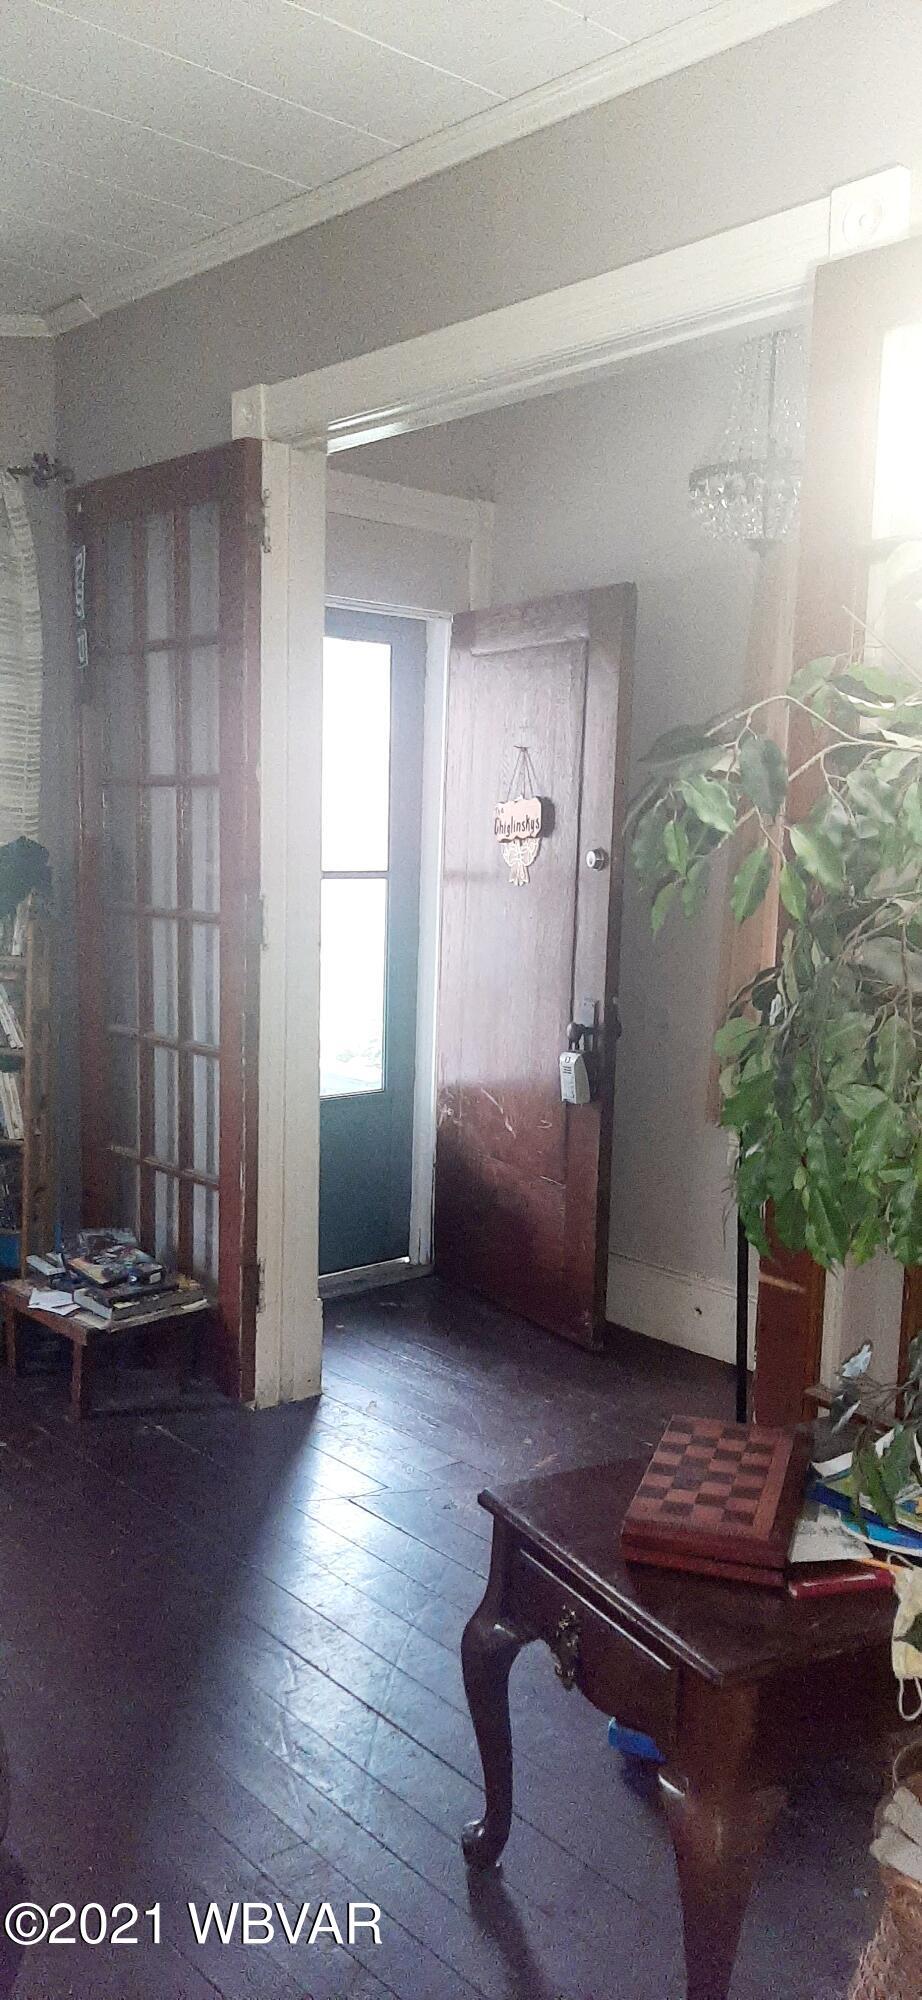 413 LOUISA STREET, Williamsport, PA 17701, 3 Bedrooms Bedrooms, ,1 BathroomBathrooms,Residential,For sale,LOUISA,WB-92474